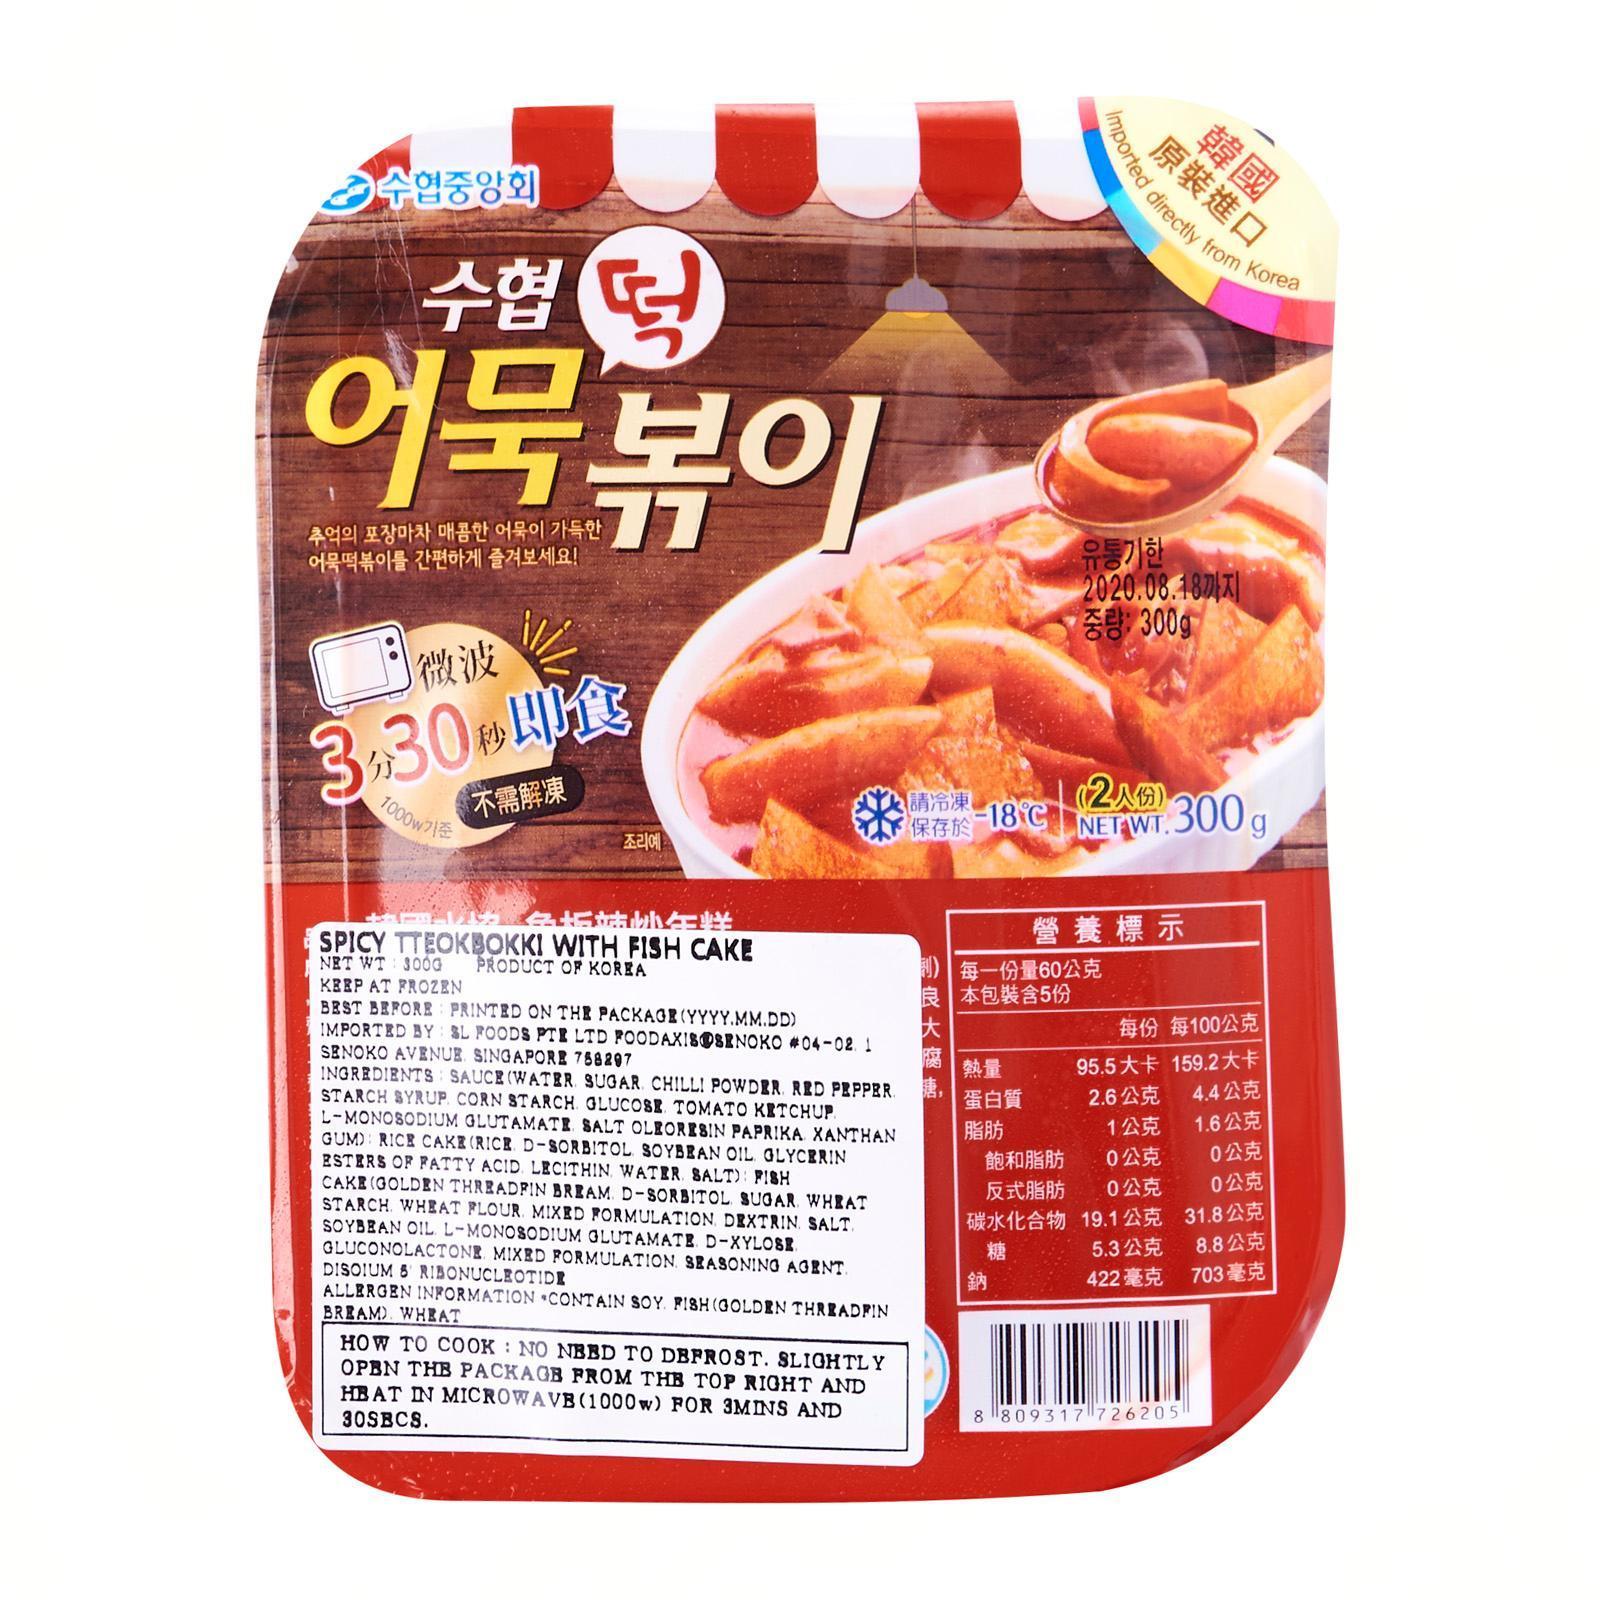 Suhyup Tteokbokki with Korean Fish Cake Spicy Rice Cake - Frozen